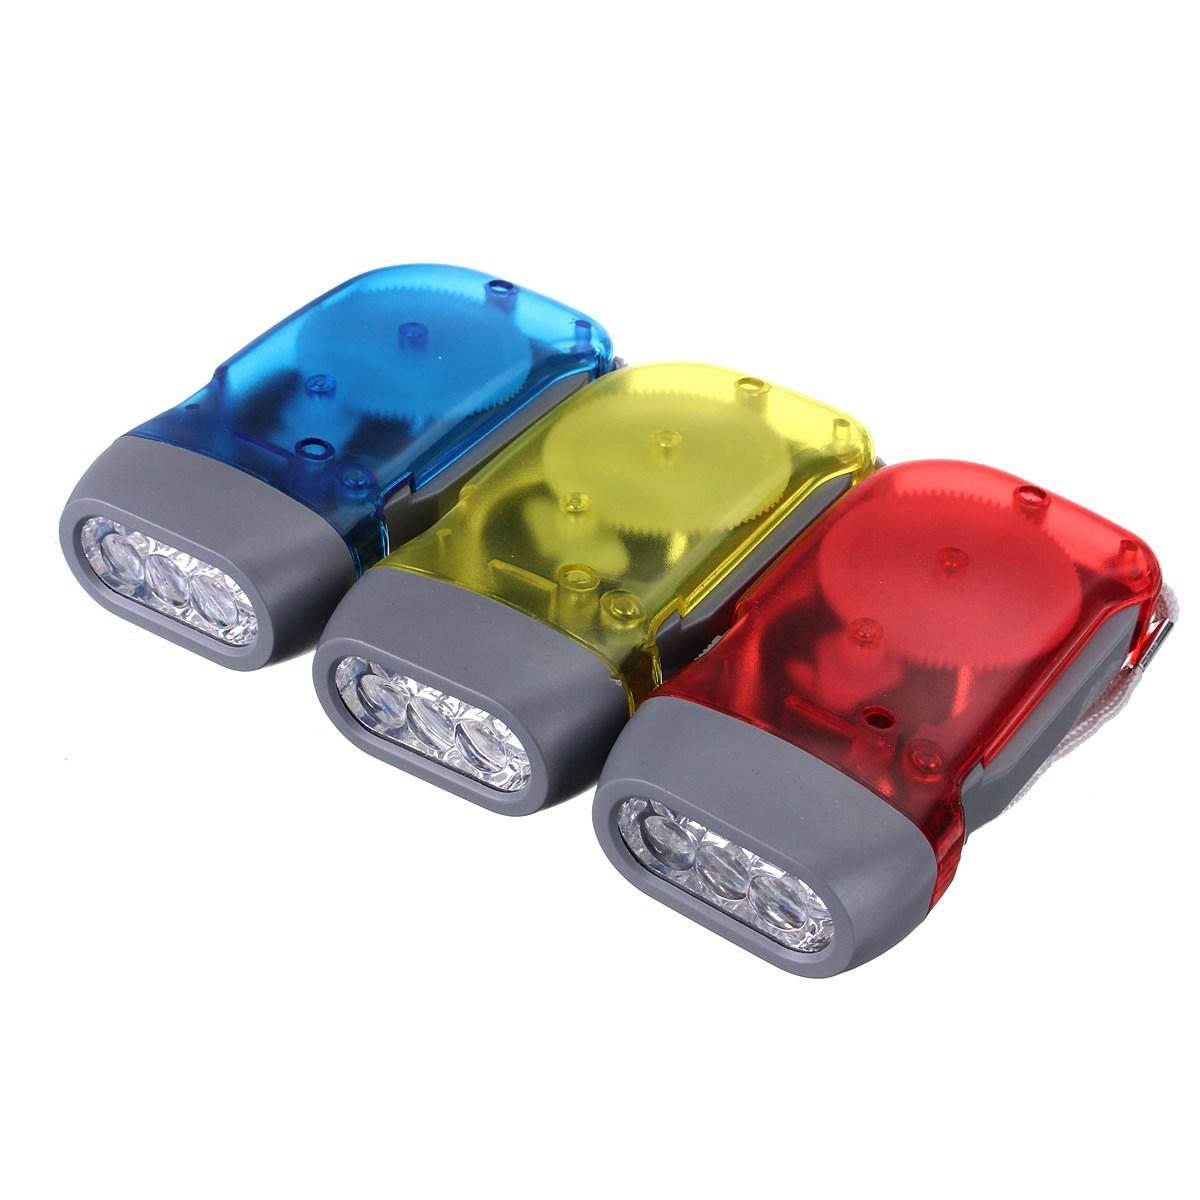 Mini Outdoor Portable 3 LED Dynamo Wind Up LED Flashlight Hand-pressing Crank NR LED Light Torch(China (Mainland))